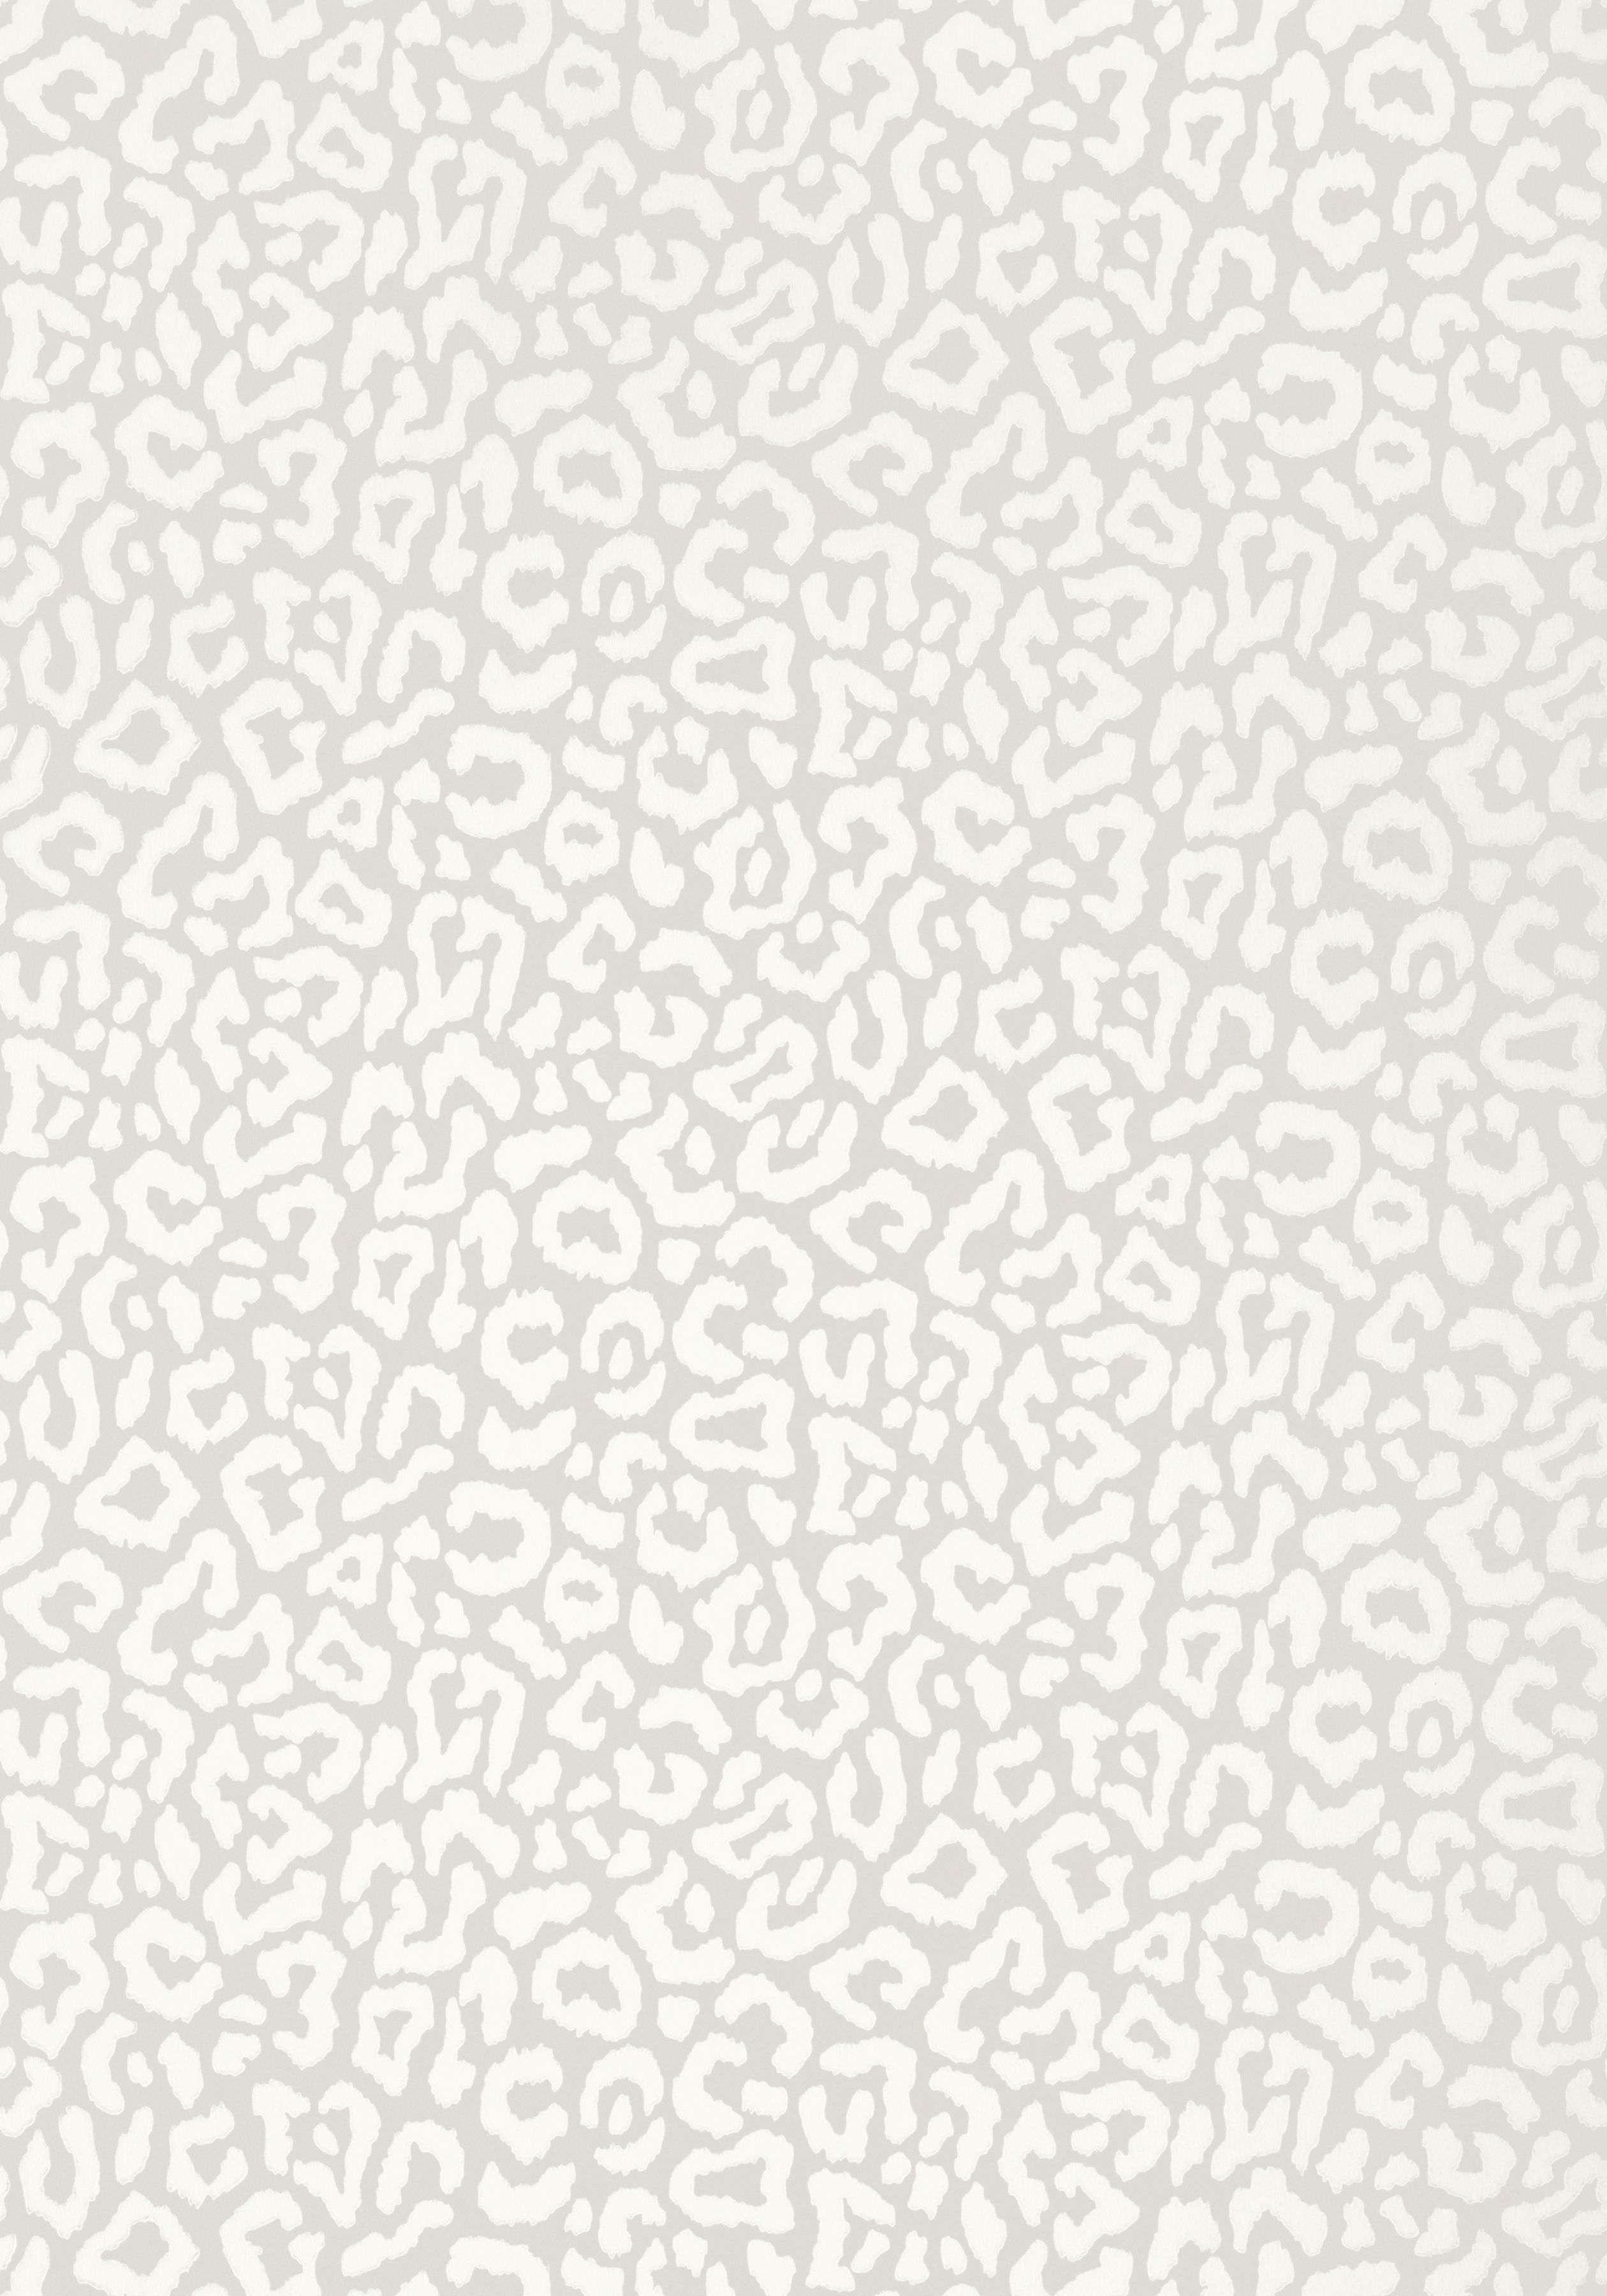 T11005 Cheetah Print Wallpaper Animal Print Wallpaper Iphone Background Wallpaper